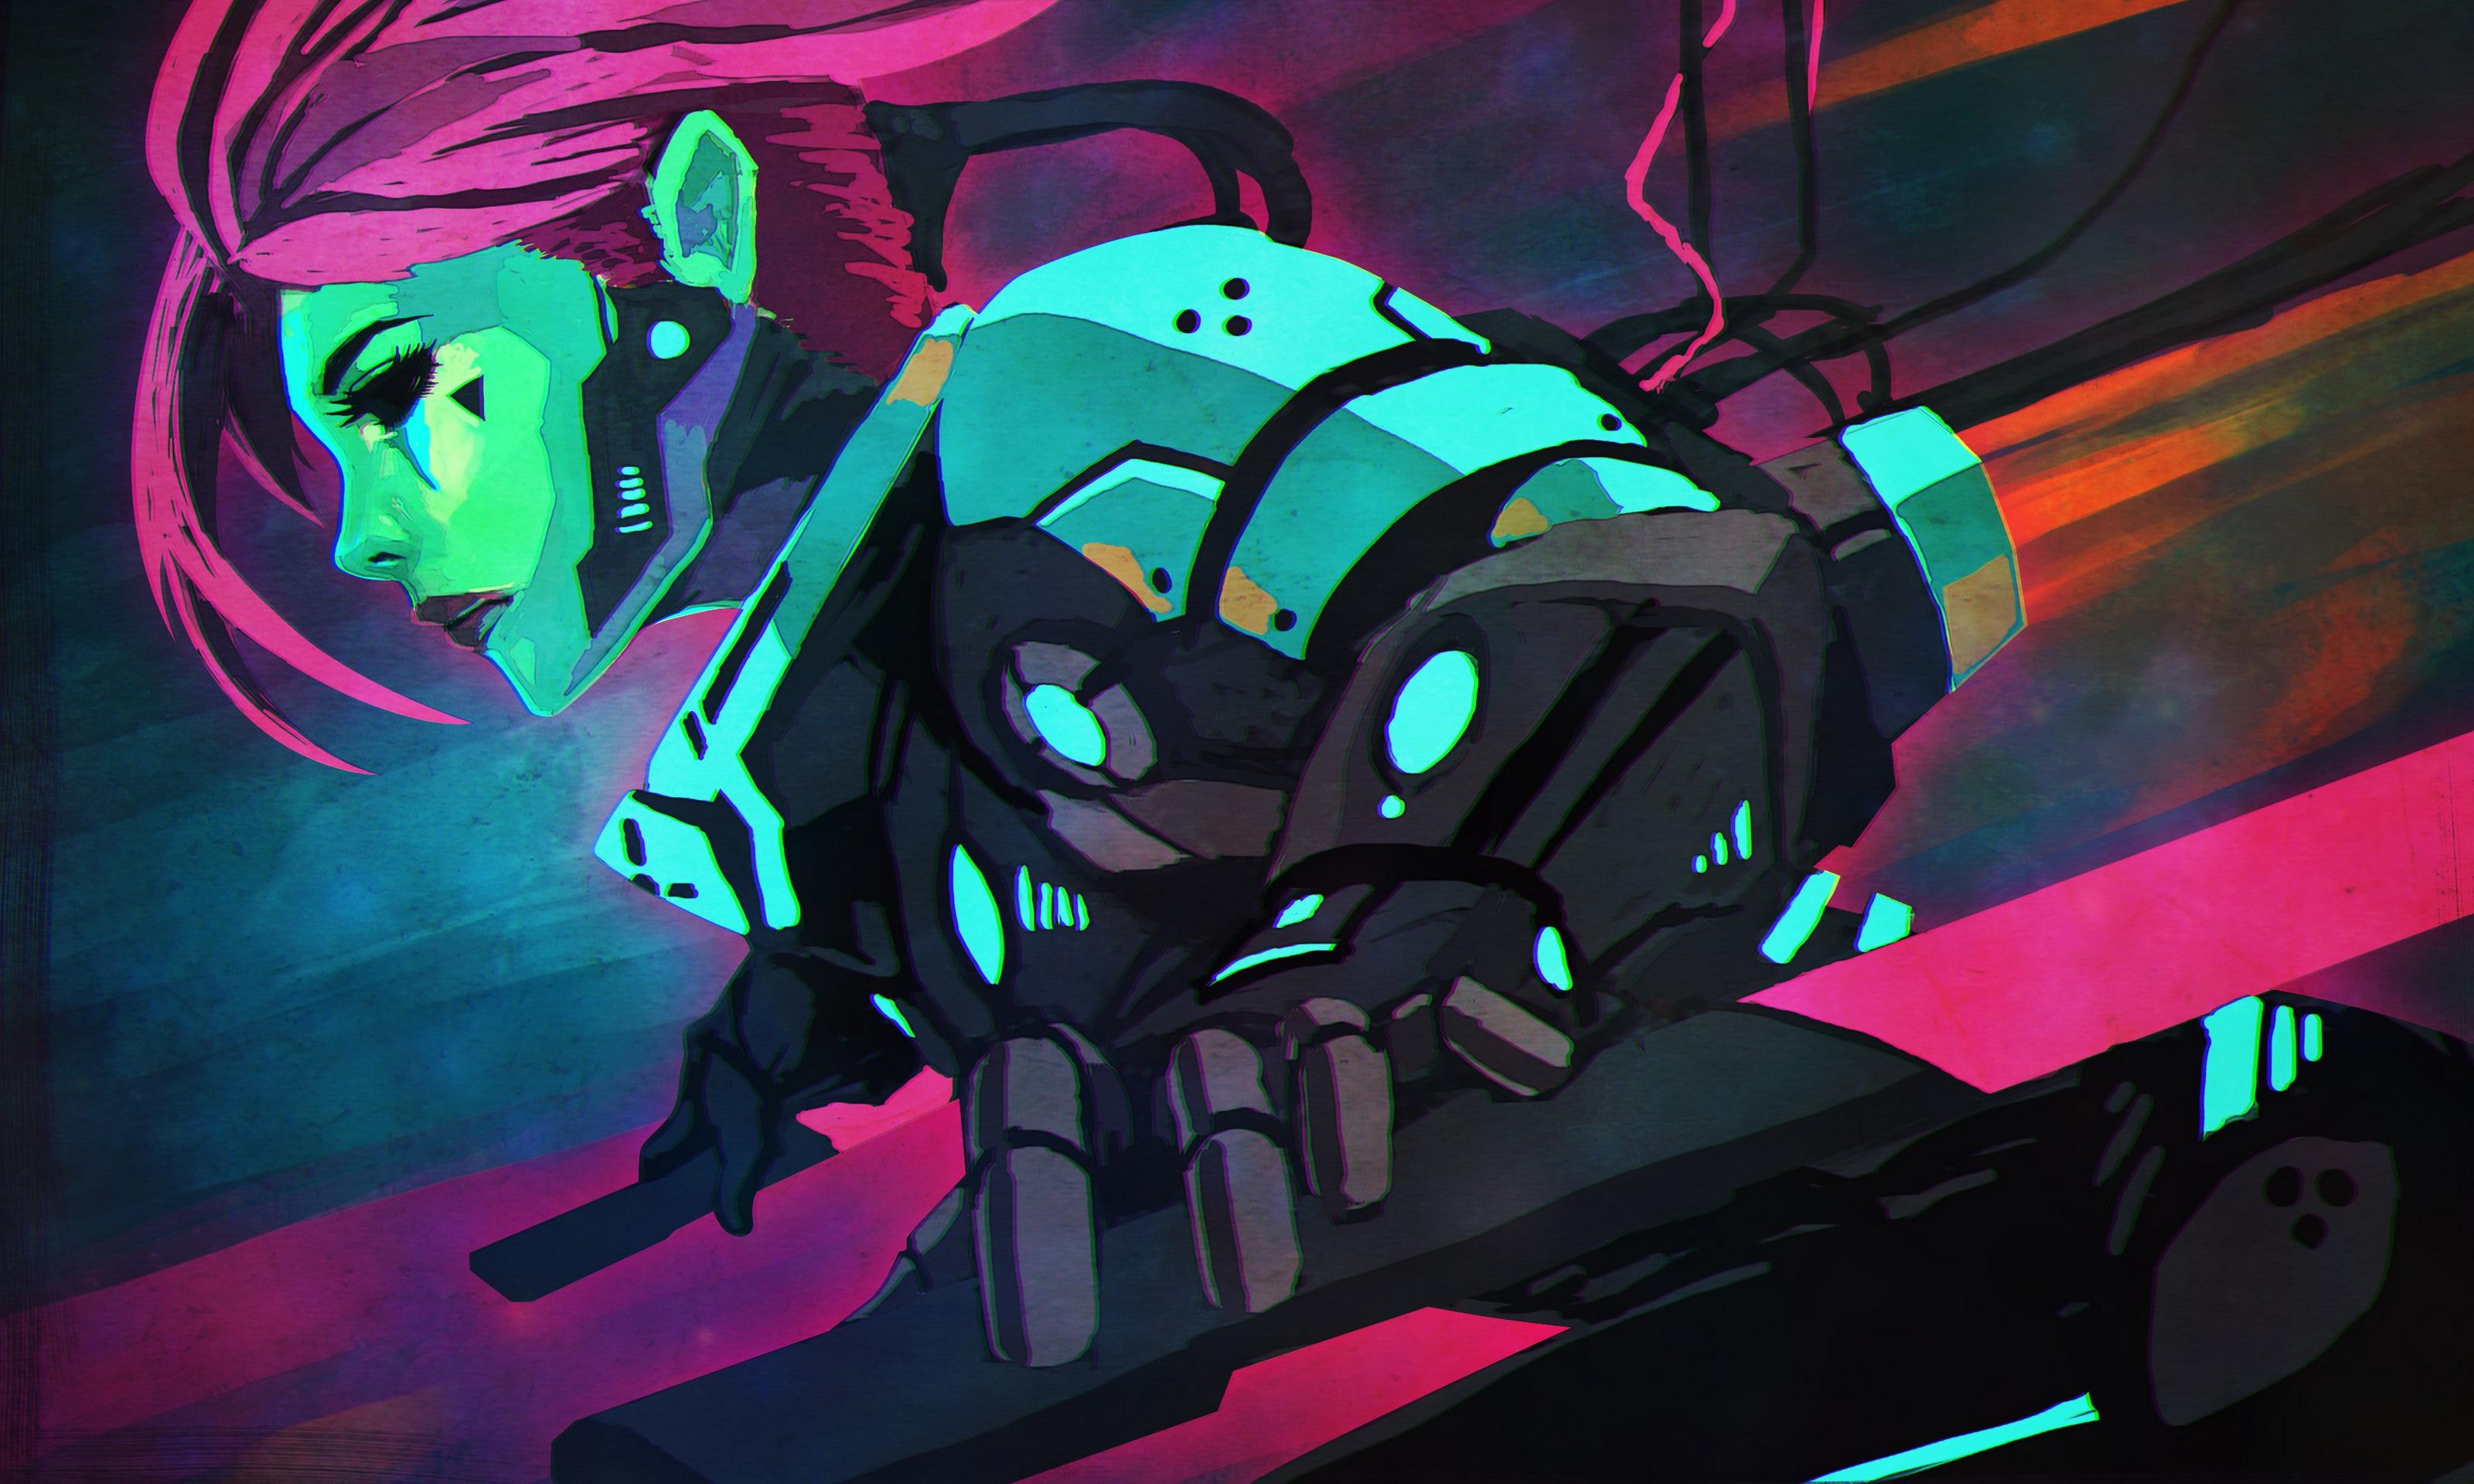 General 3200x1920 illustration women cyberpunk artwork futuristic pink turquoise green cyborg